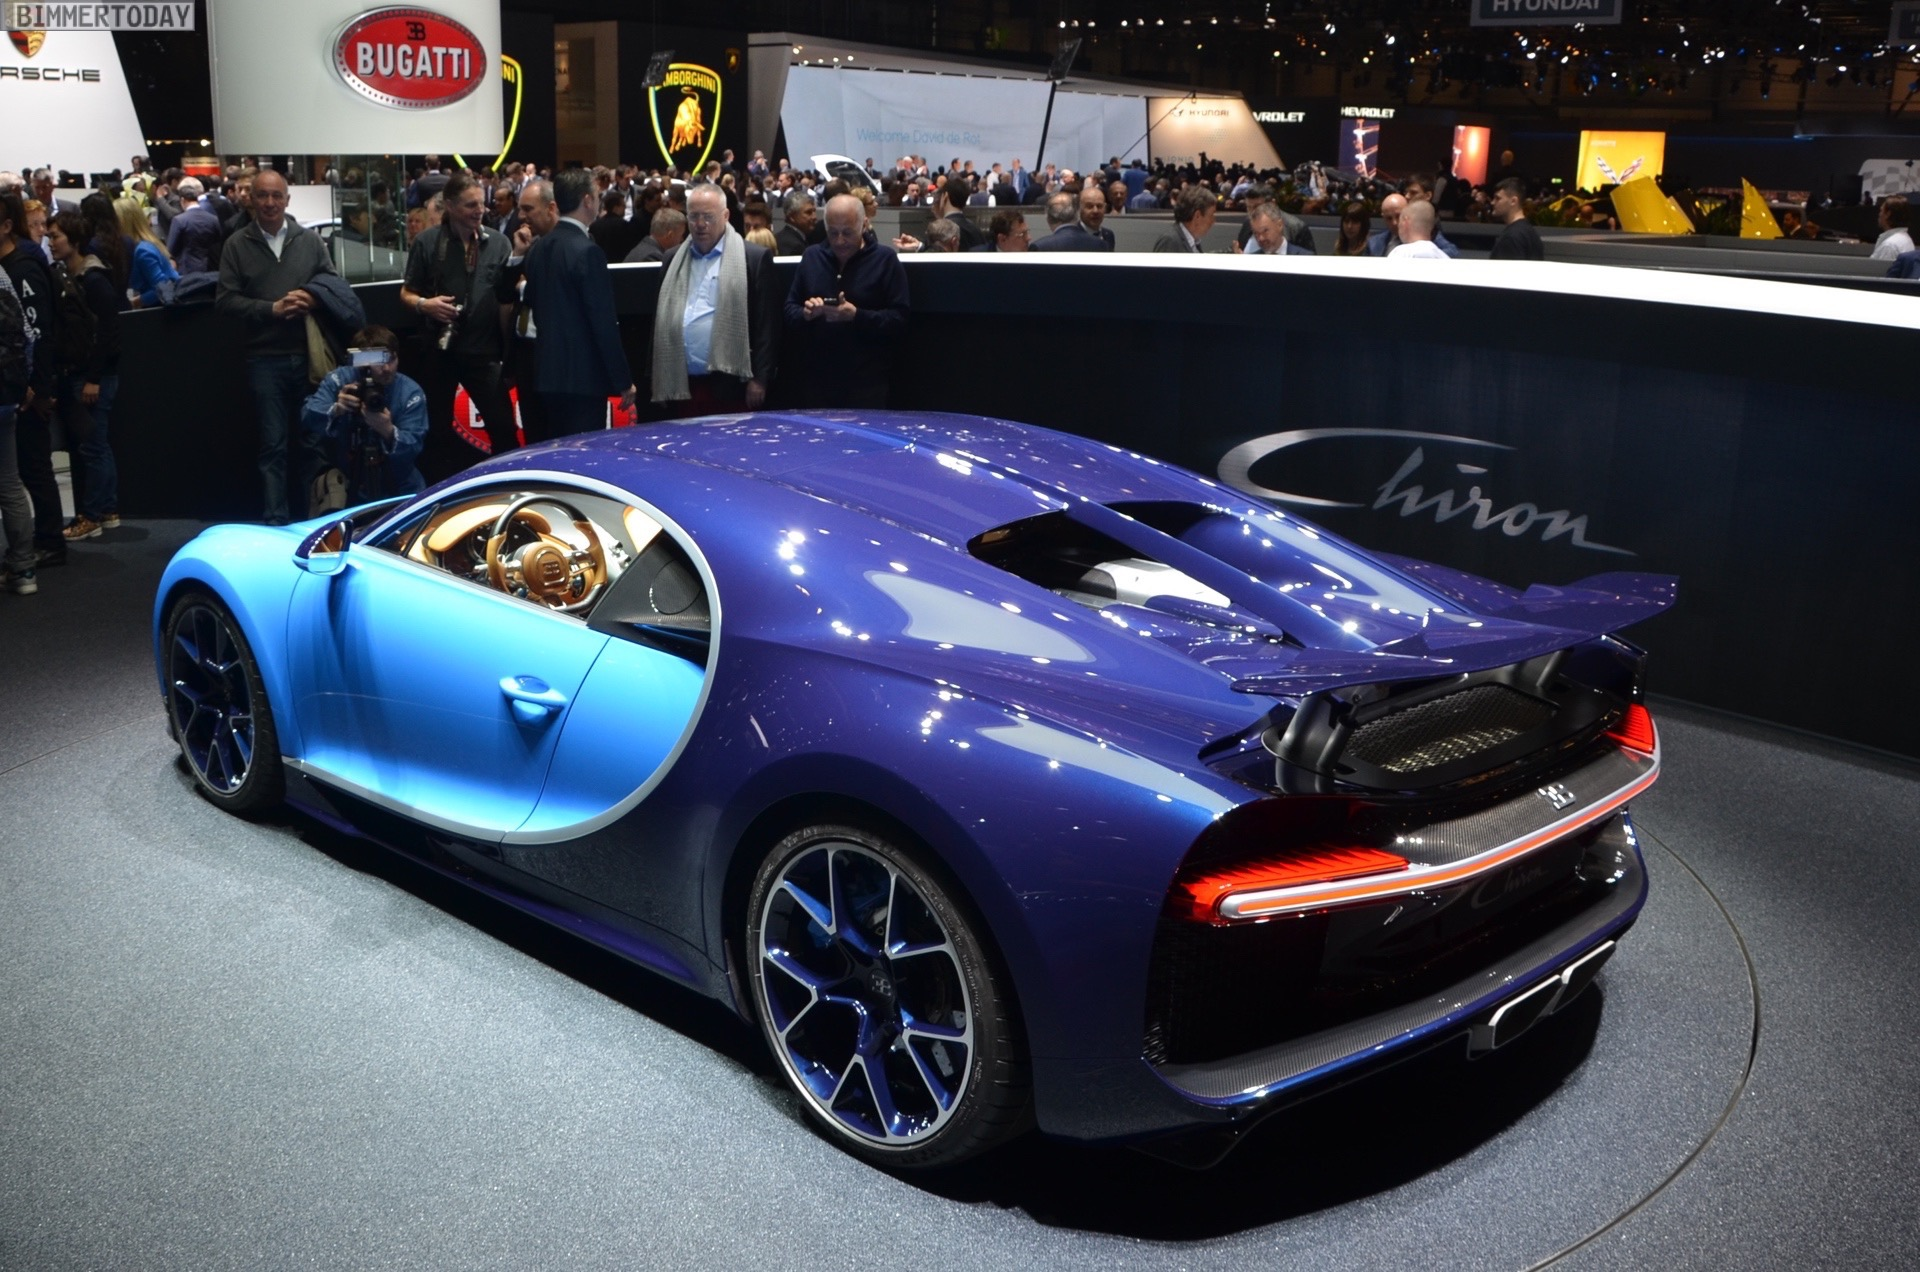 Bugatti Chiron With 1500 Horsepower